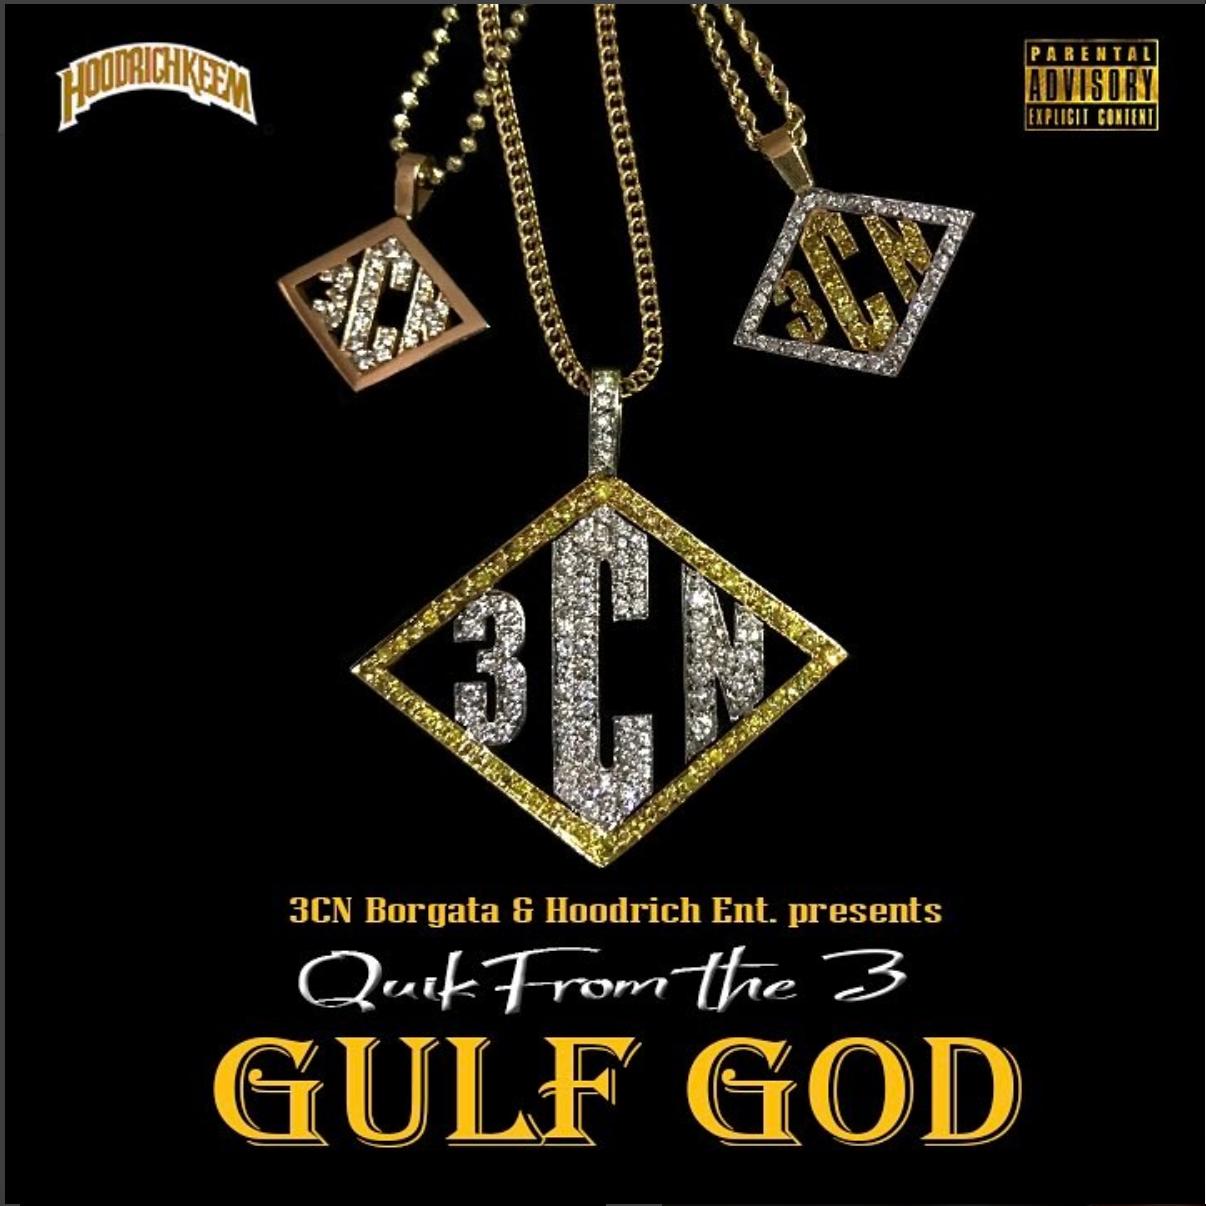 Quik From The 3 - Gulf God Mixtape